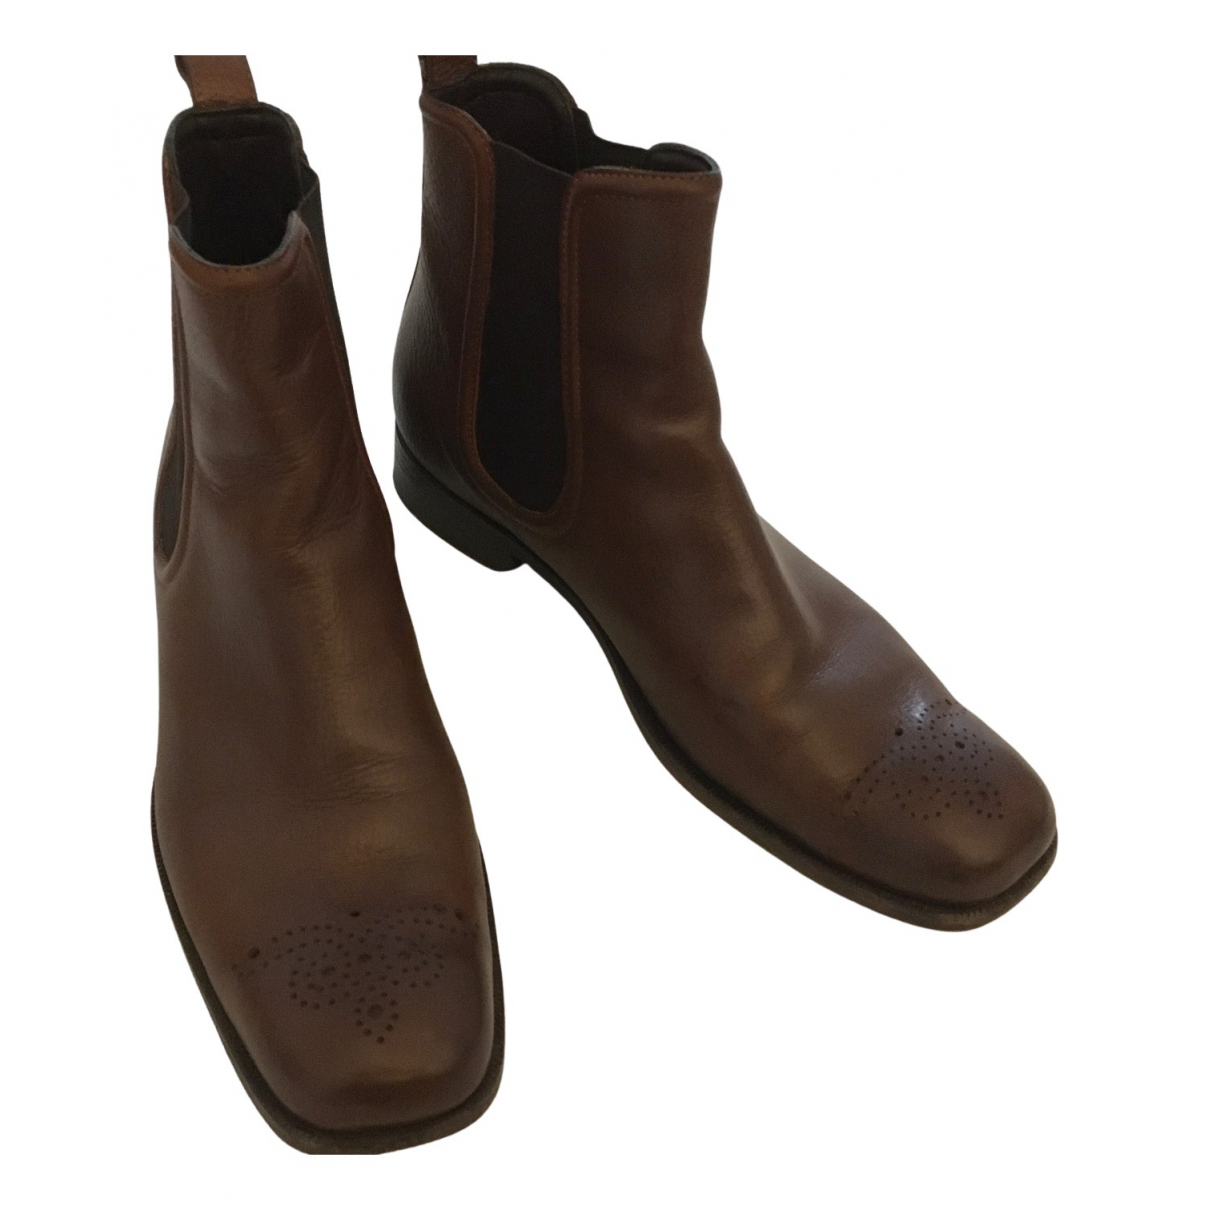 Bottega Veneta - Boots   pour femme en cuir - marron